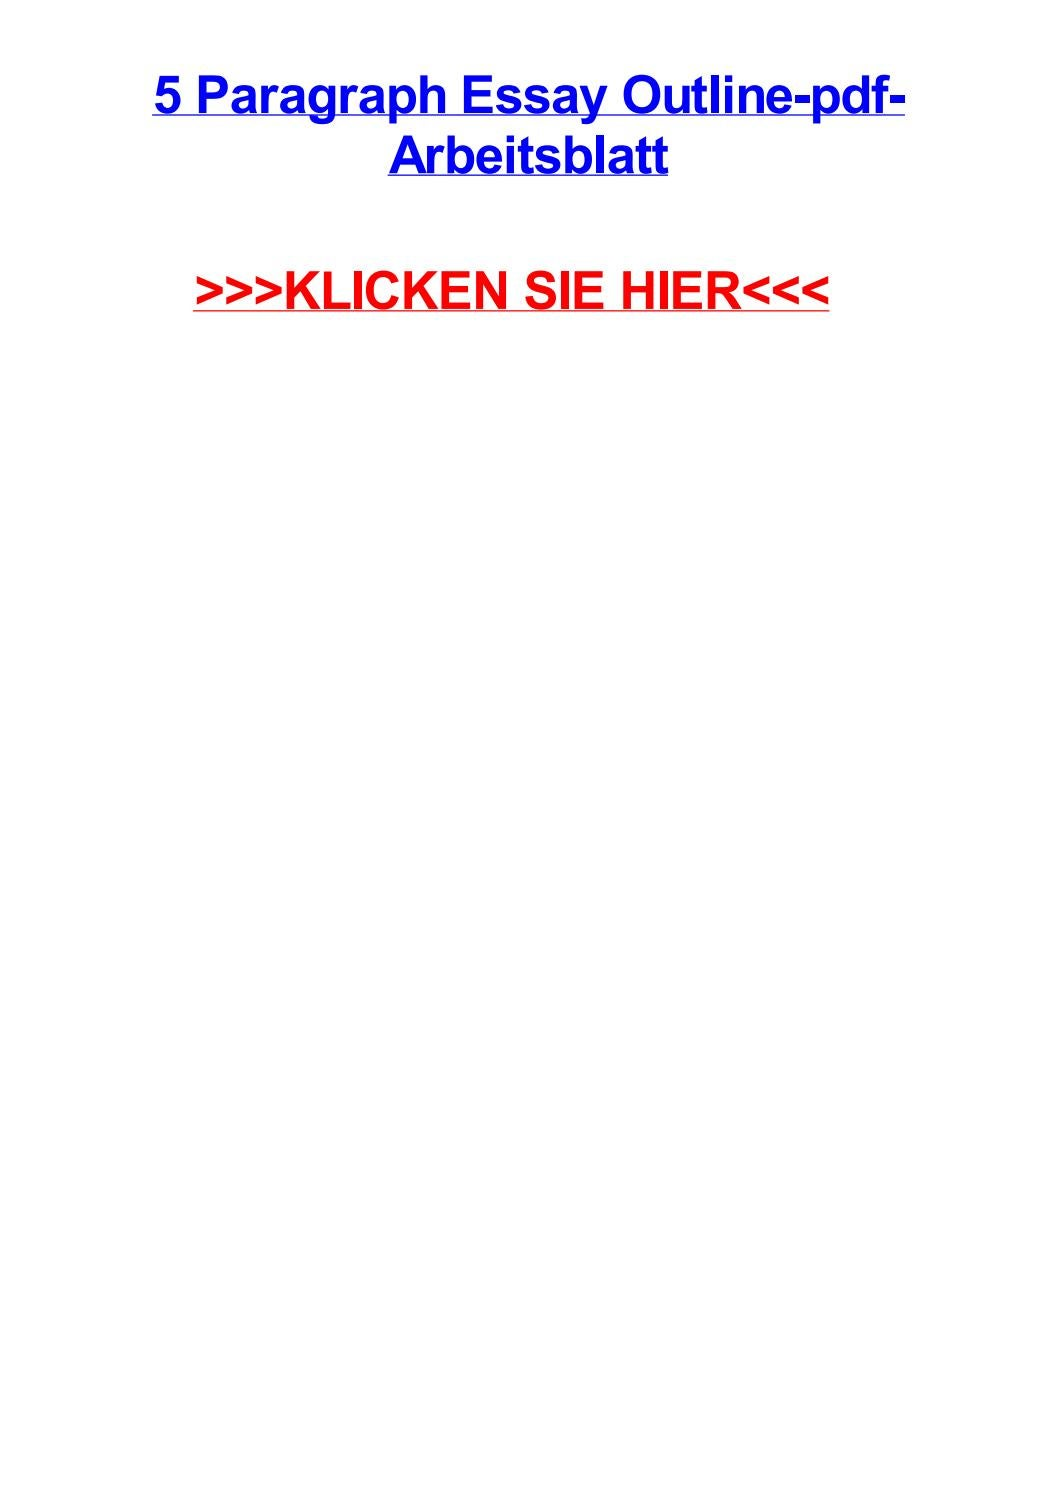 5 paragraph essay outline pdf arbeitsblatt by markwziaz - issuu